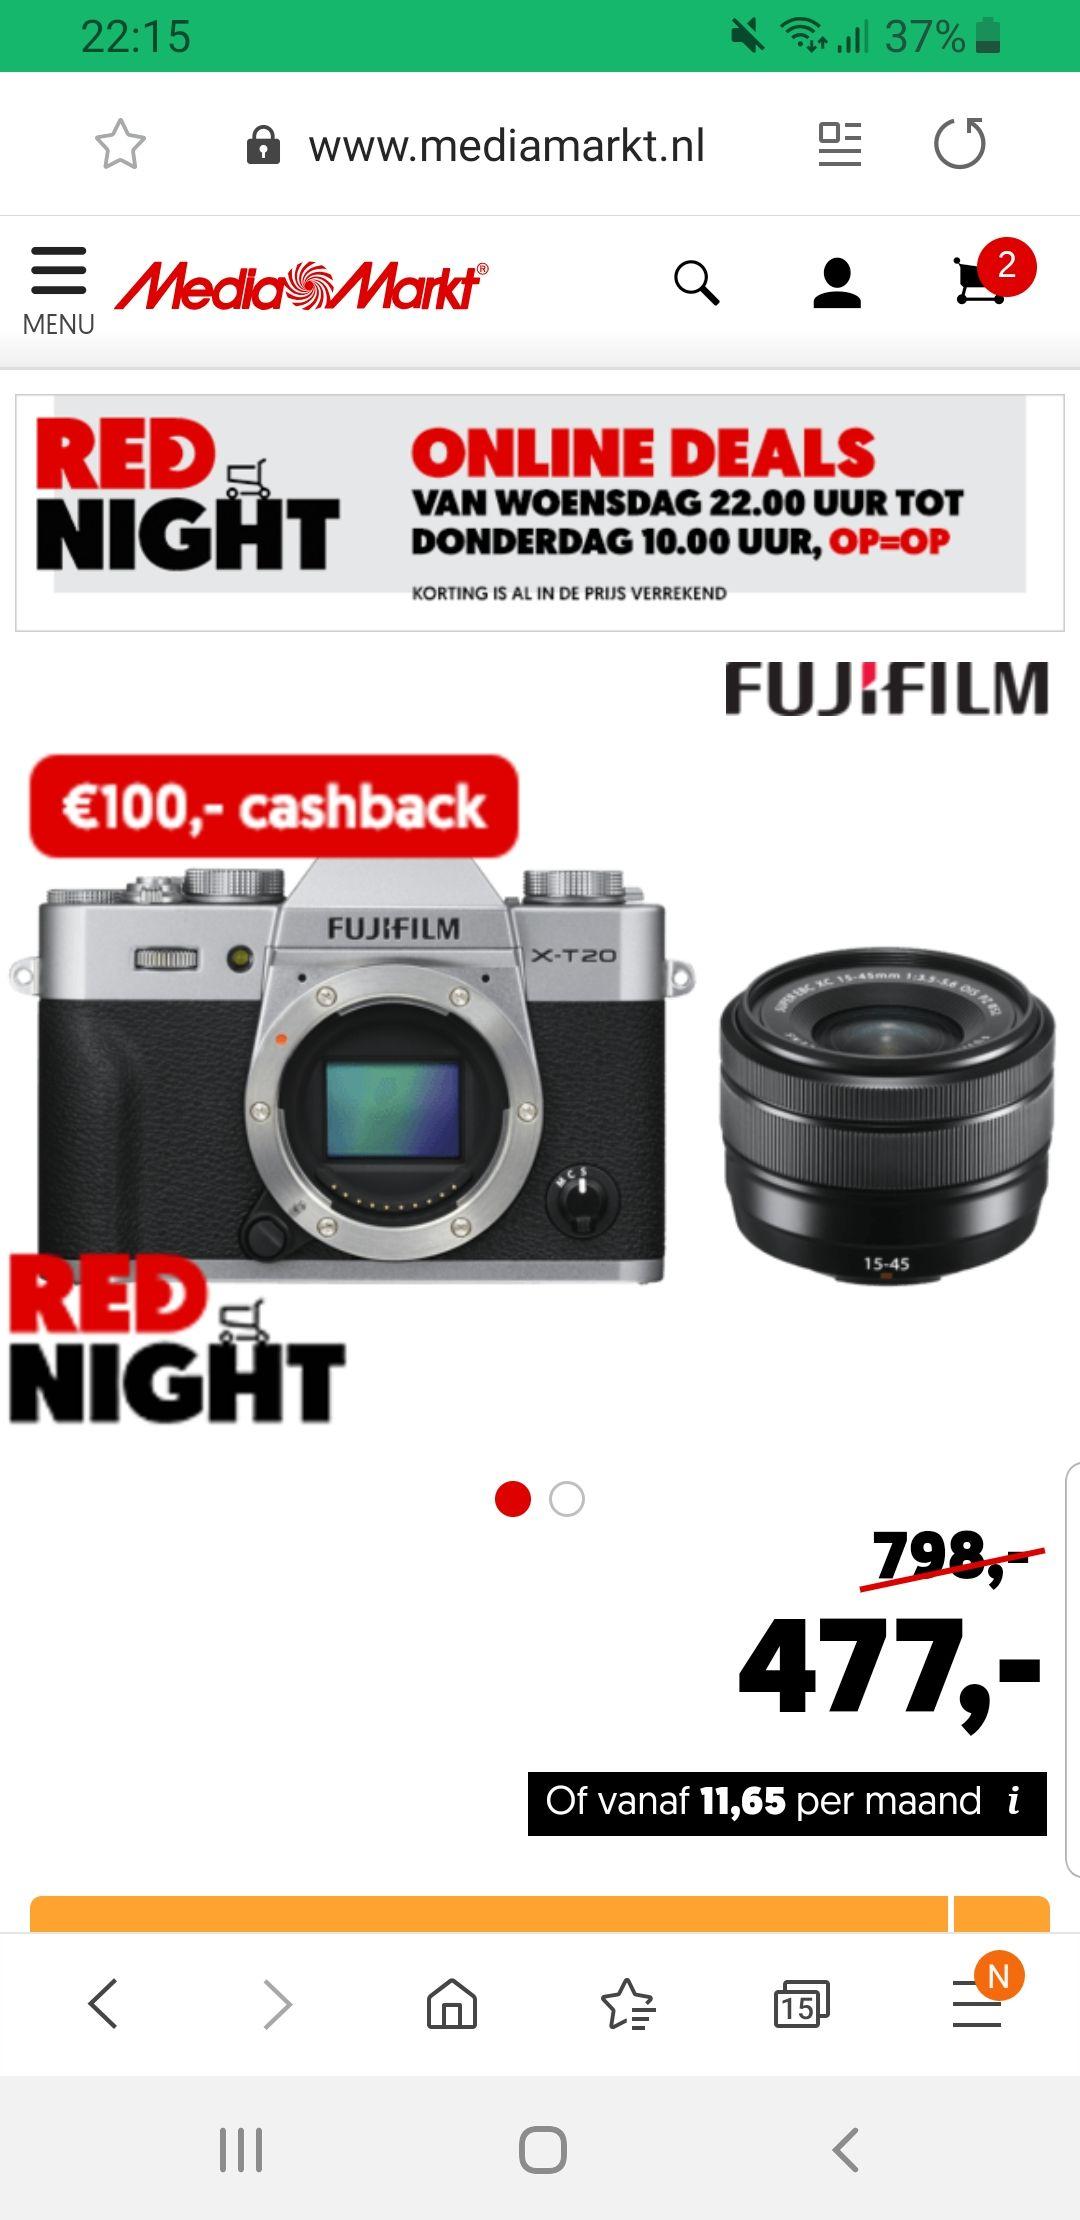 FUJIFILM X-T20 Zilver + XC15-45mm Kit EE @ Mediamarkt